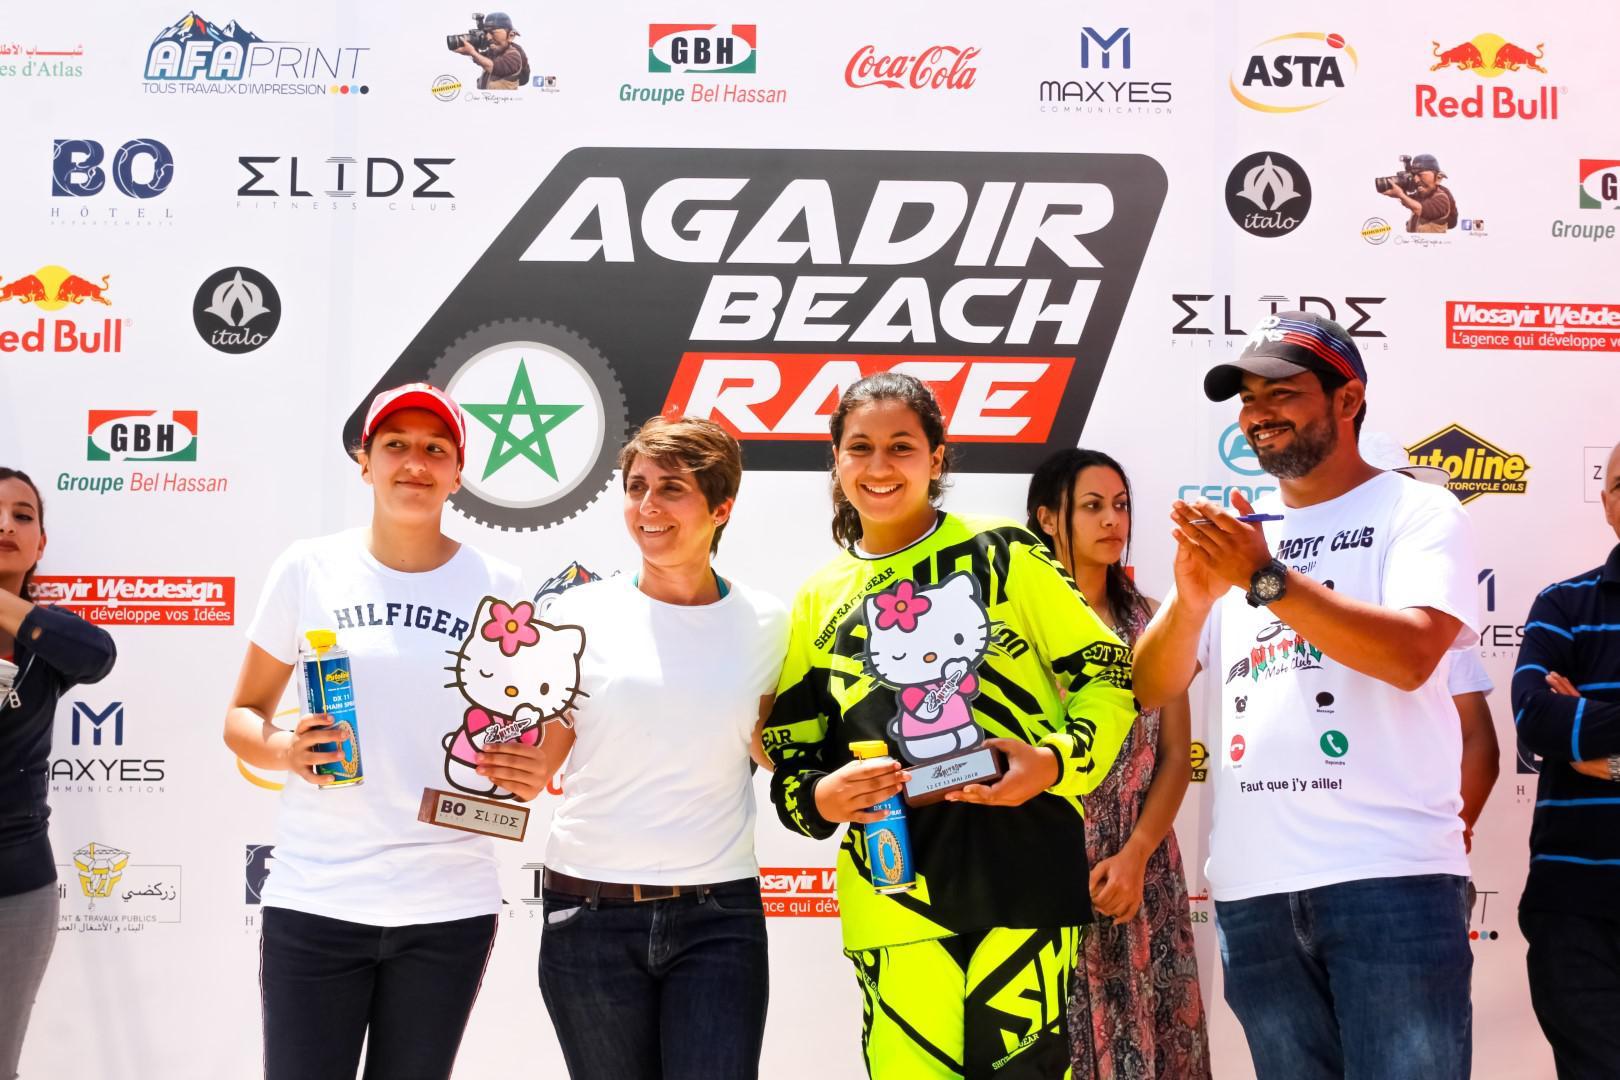 agadir-beach-race-la-reussite-791-16.jpg